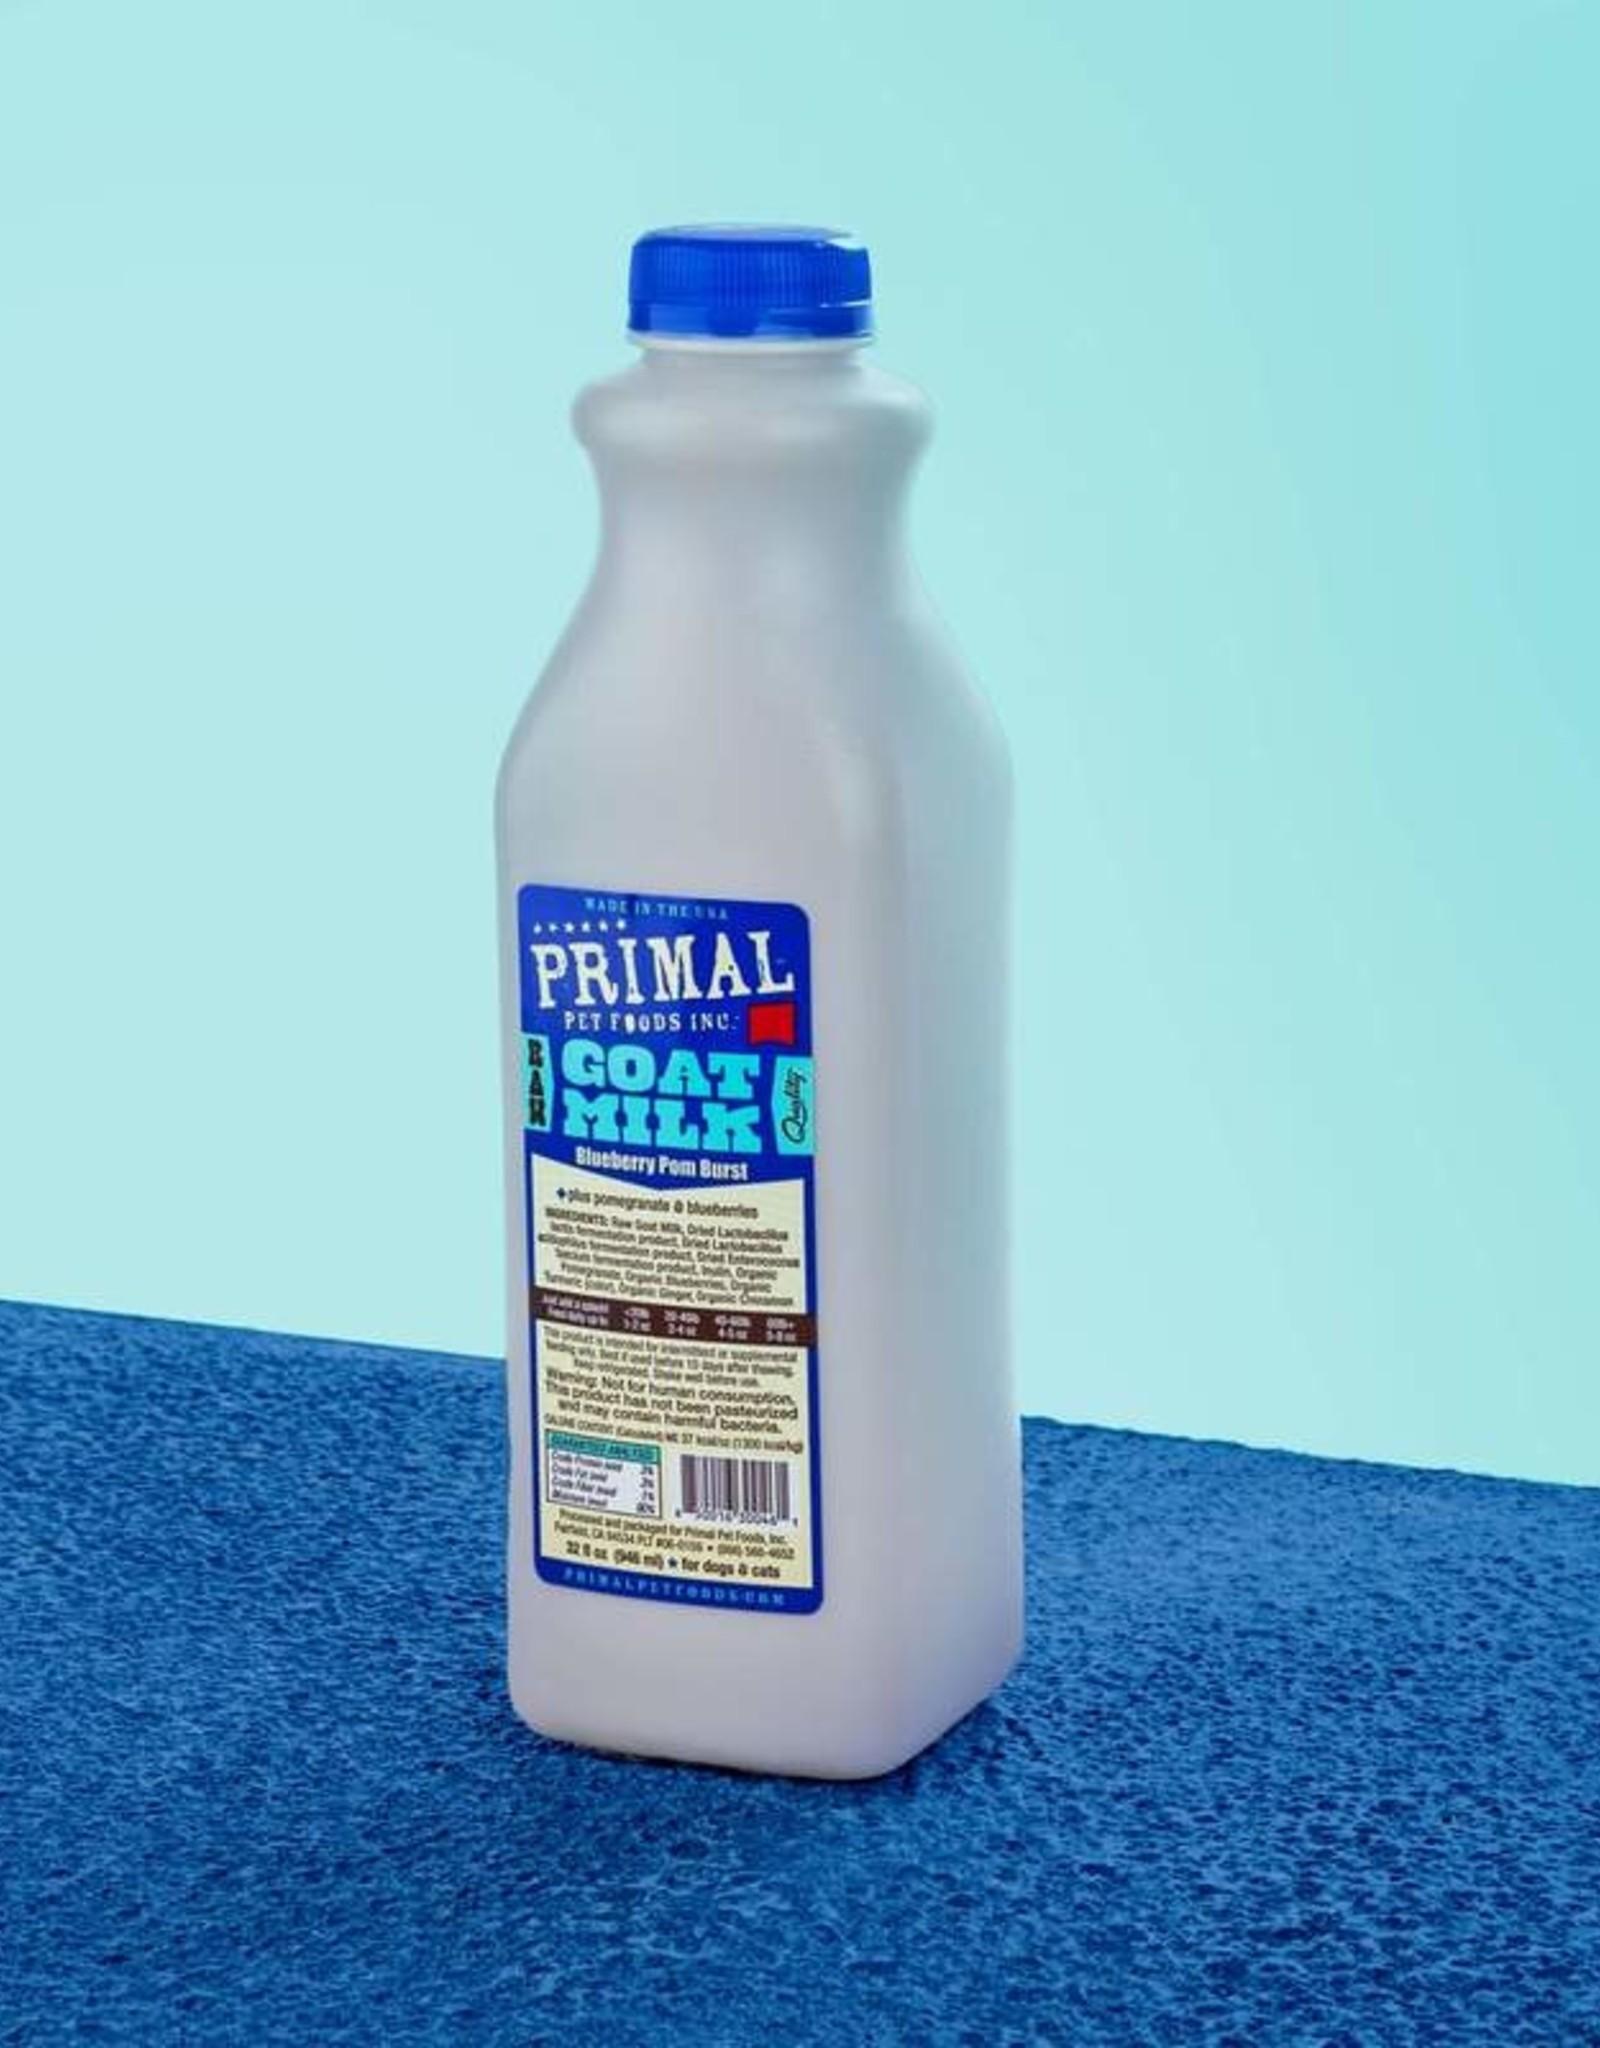 Primal Blueberry Pomegranate Goat Milk 32oz